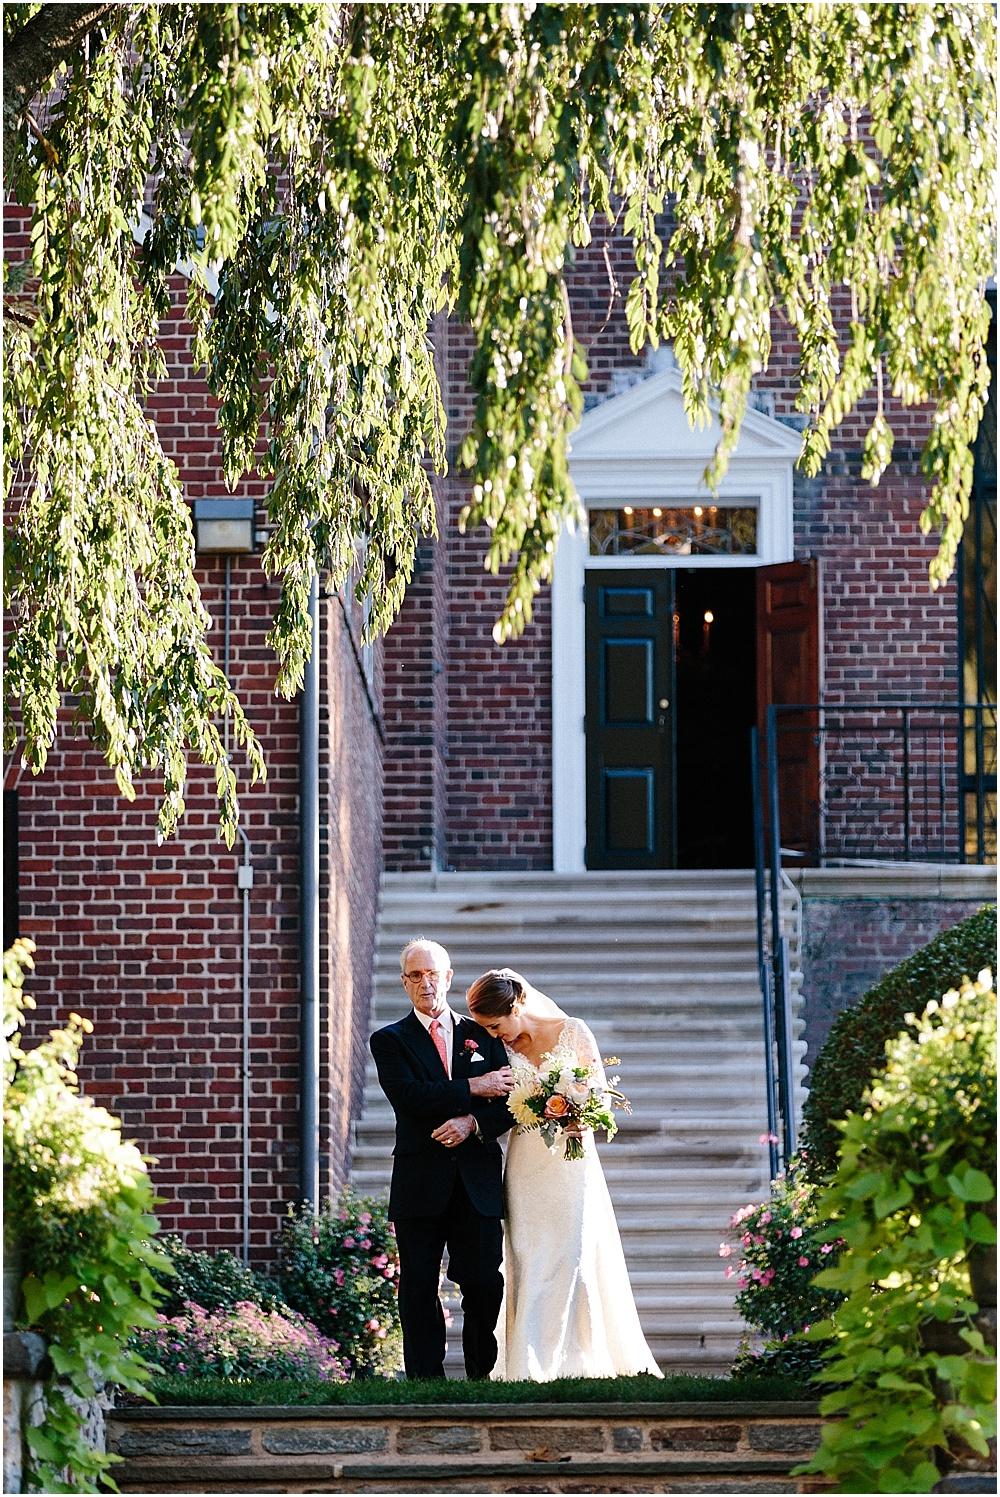 Vane_Baltimore_Country_Club_Wedding_Baltimore_Wedding_Photographer_0093